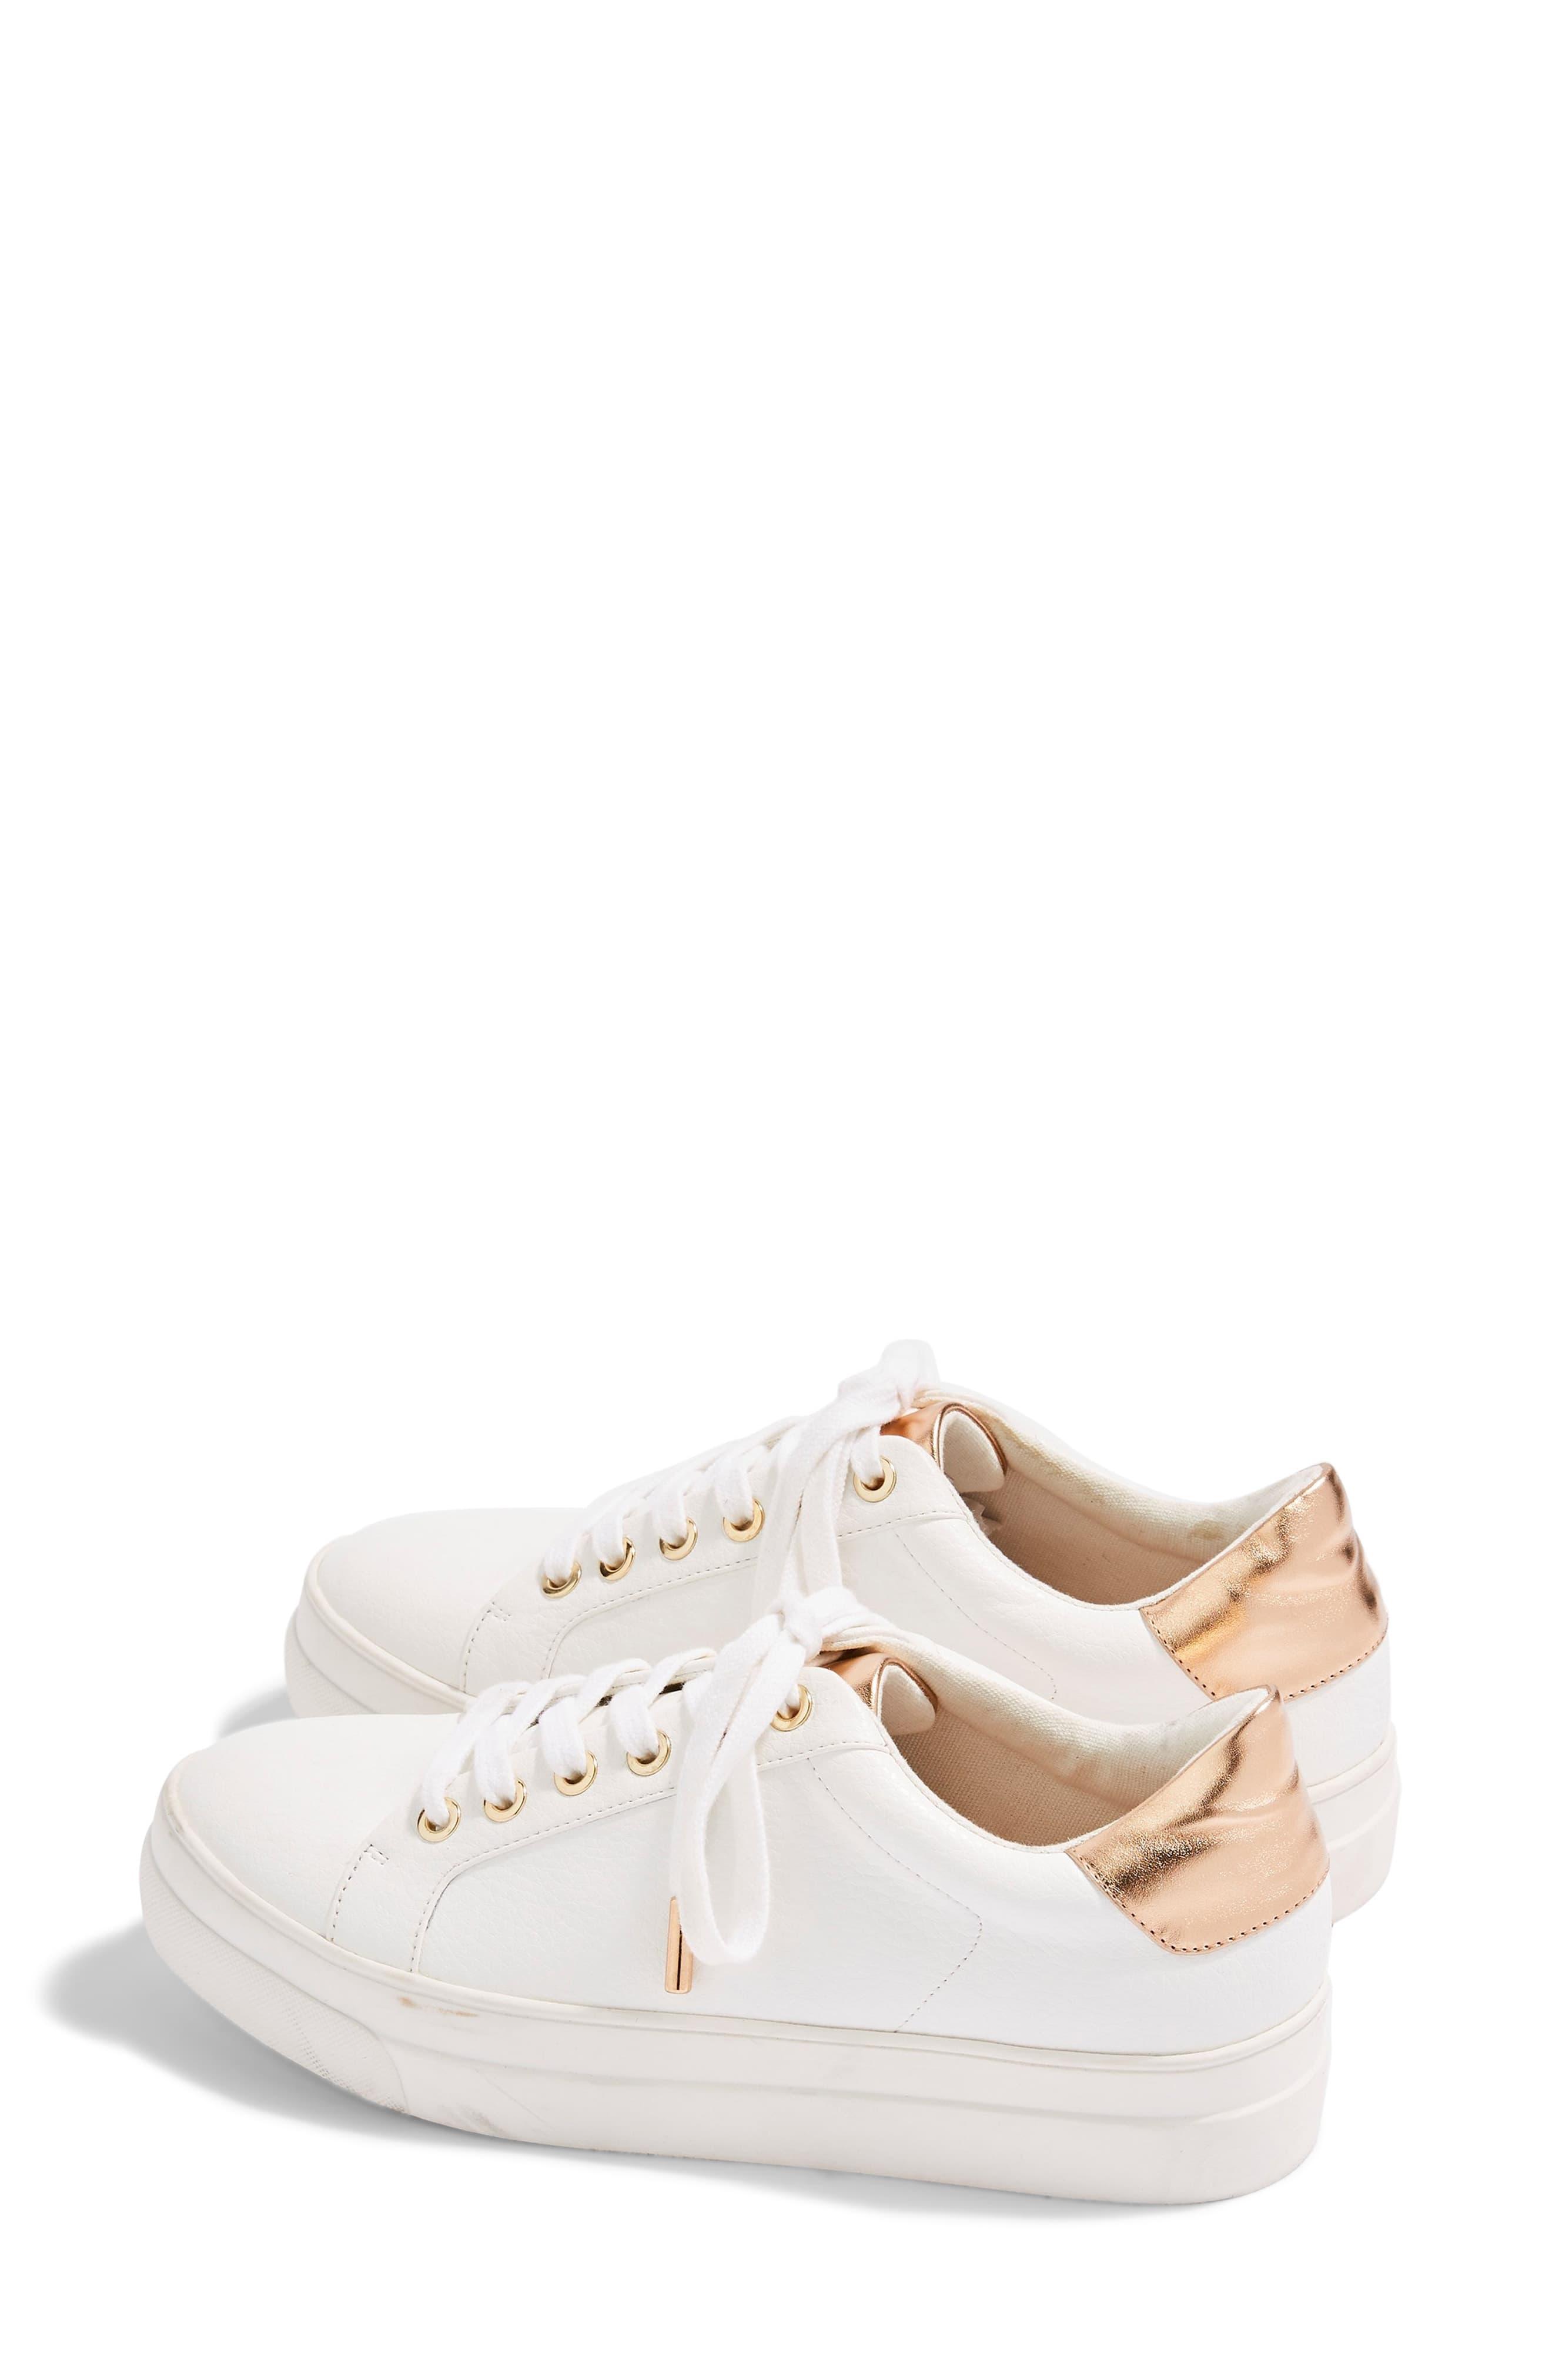 60b73281d761f4 topshop-Rose-Gold-Candy-Platform-Sneaker.jpeg